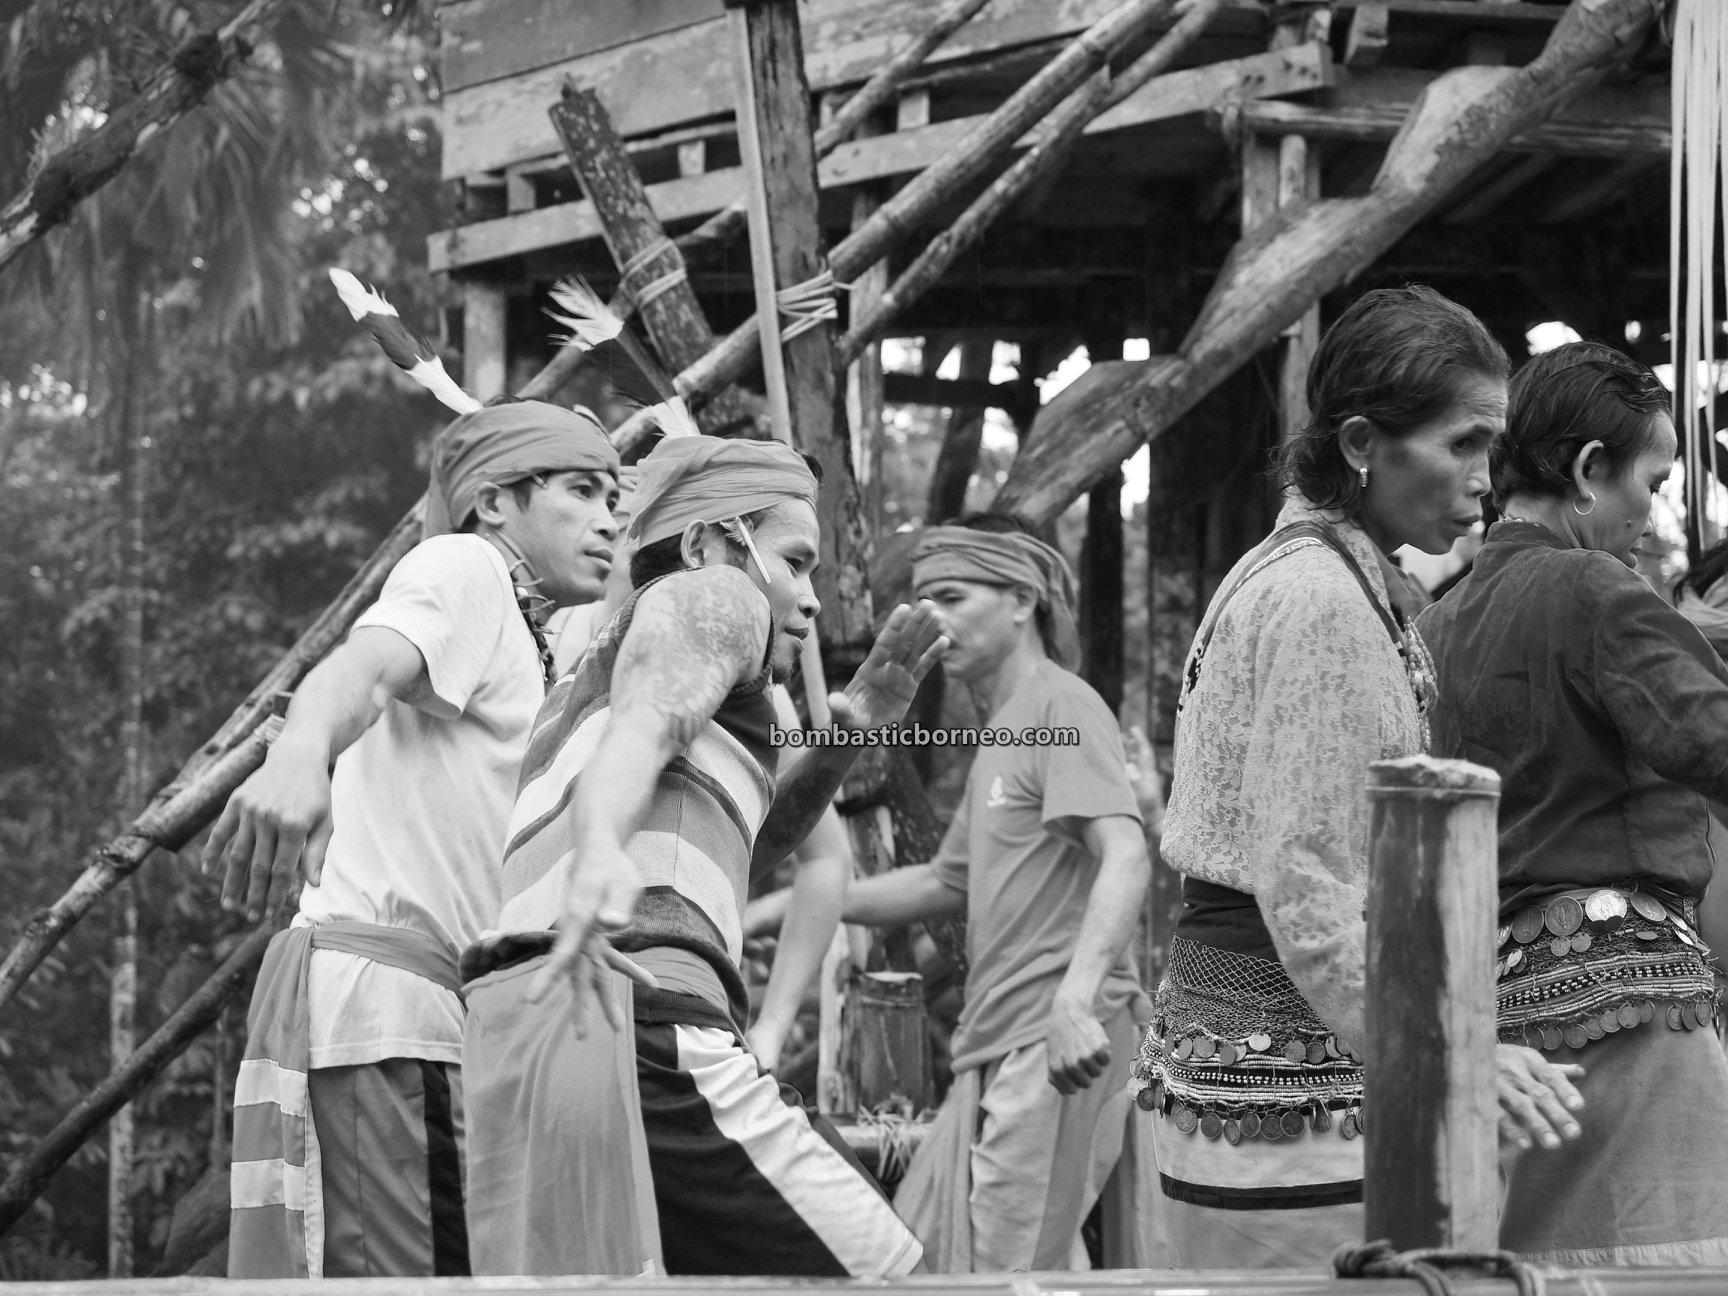 Nyobeng Kambih, Rice Harvest Festival, authentic, Cuture, Indonesia, West Kalimantan, Bengkayang, Desa Bengkawan, Dayak Kowon't, Ethnic, indigenous, objek wisata, Tourism, Travel guide, Trans Border, Borneo,